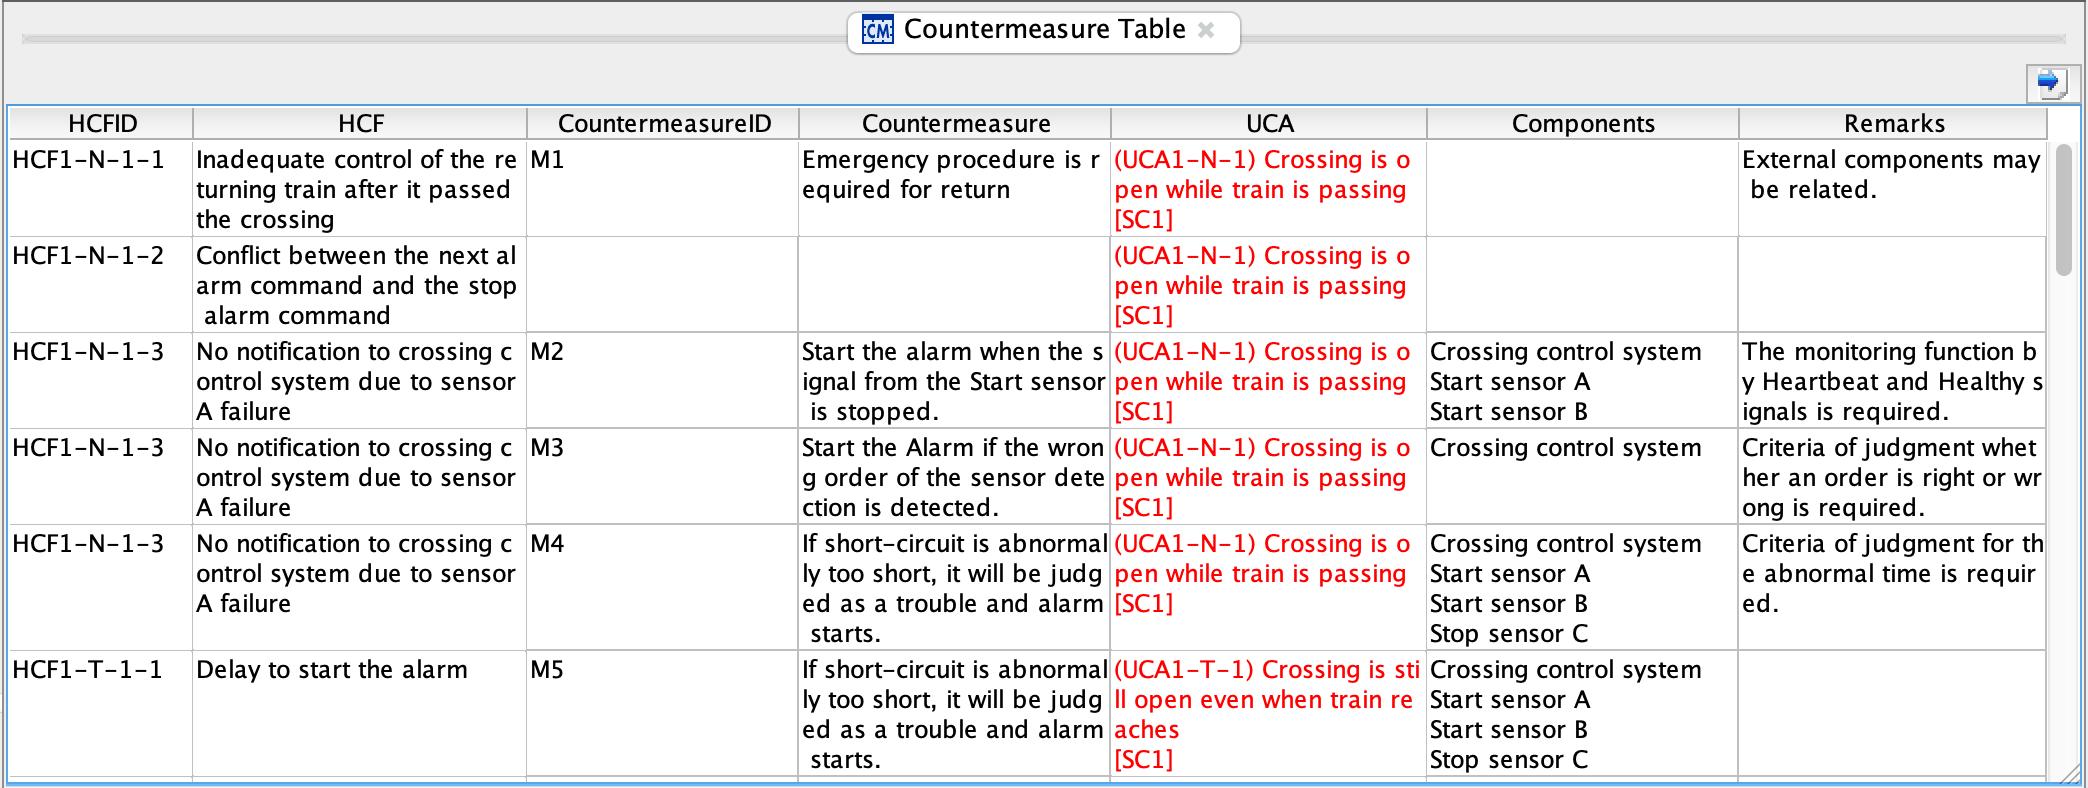 Sample of STPA Countermeasures Table